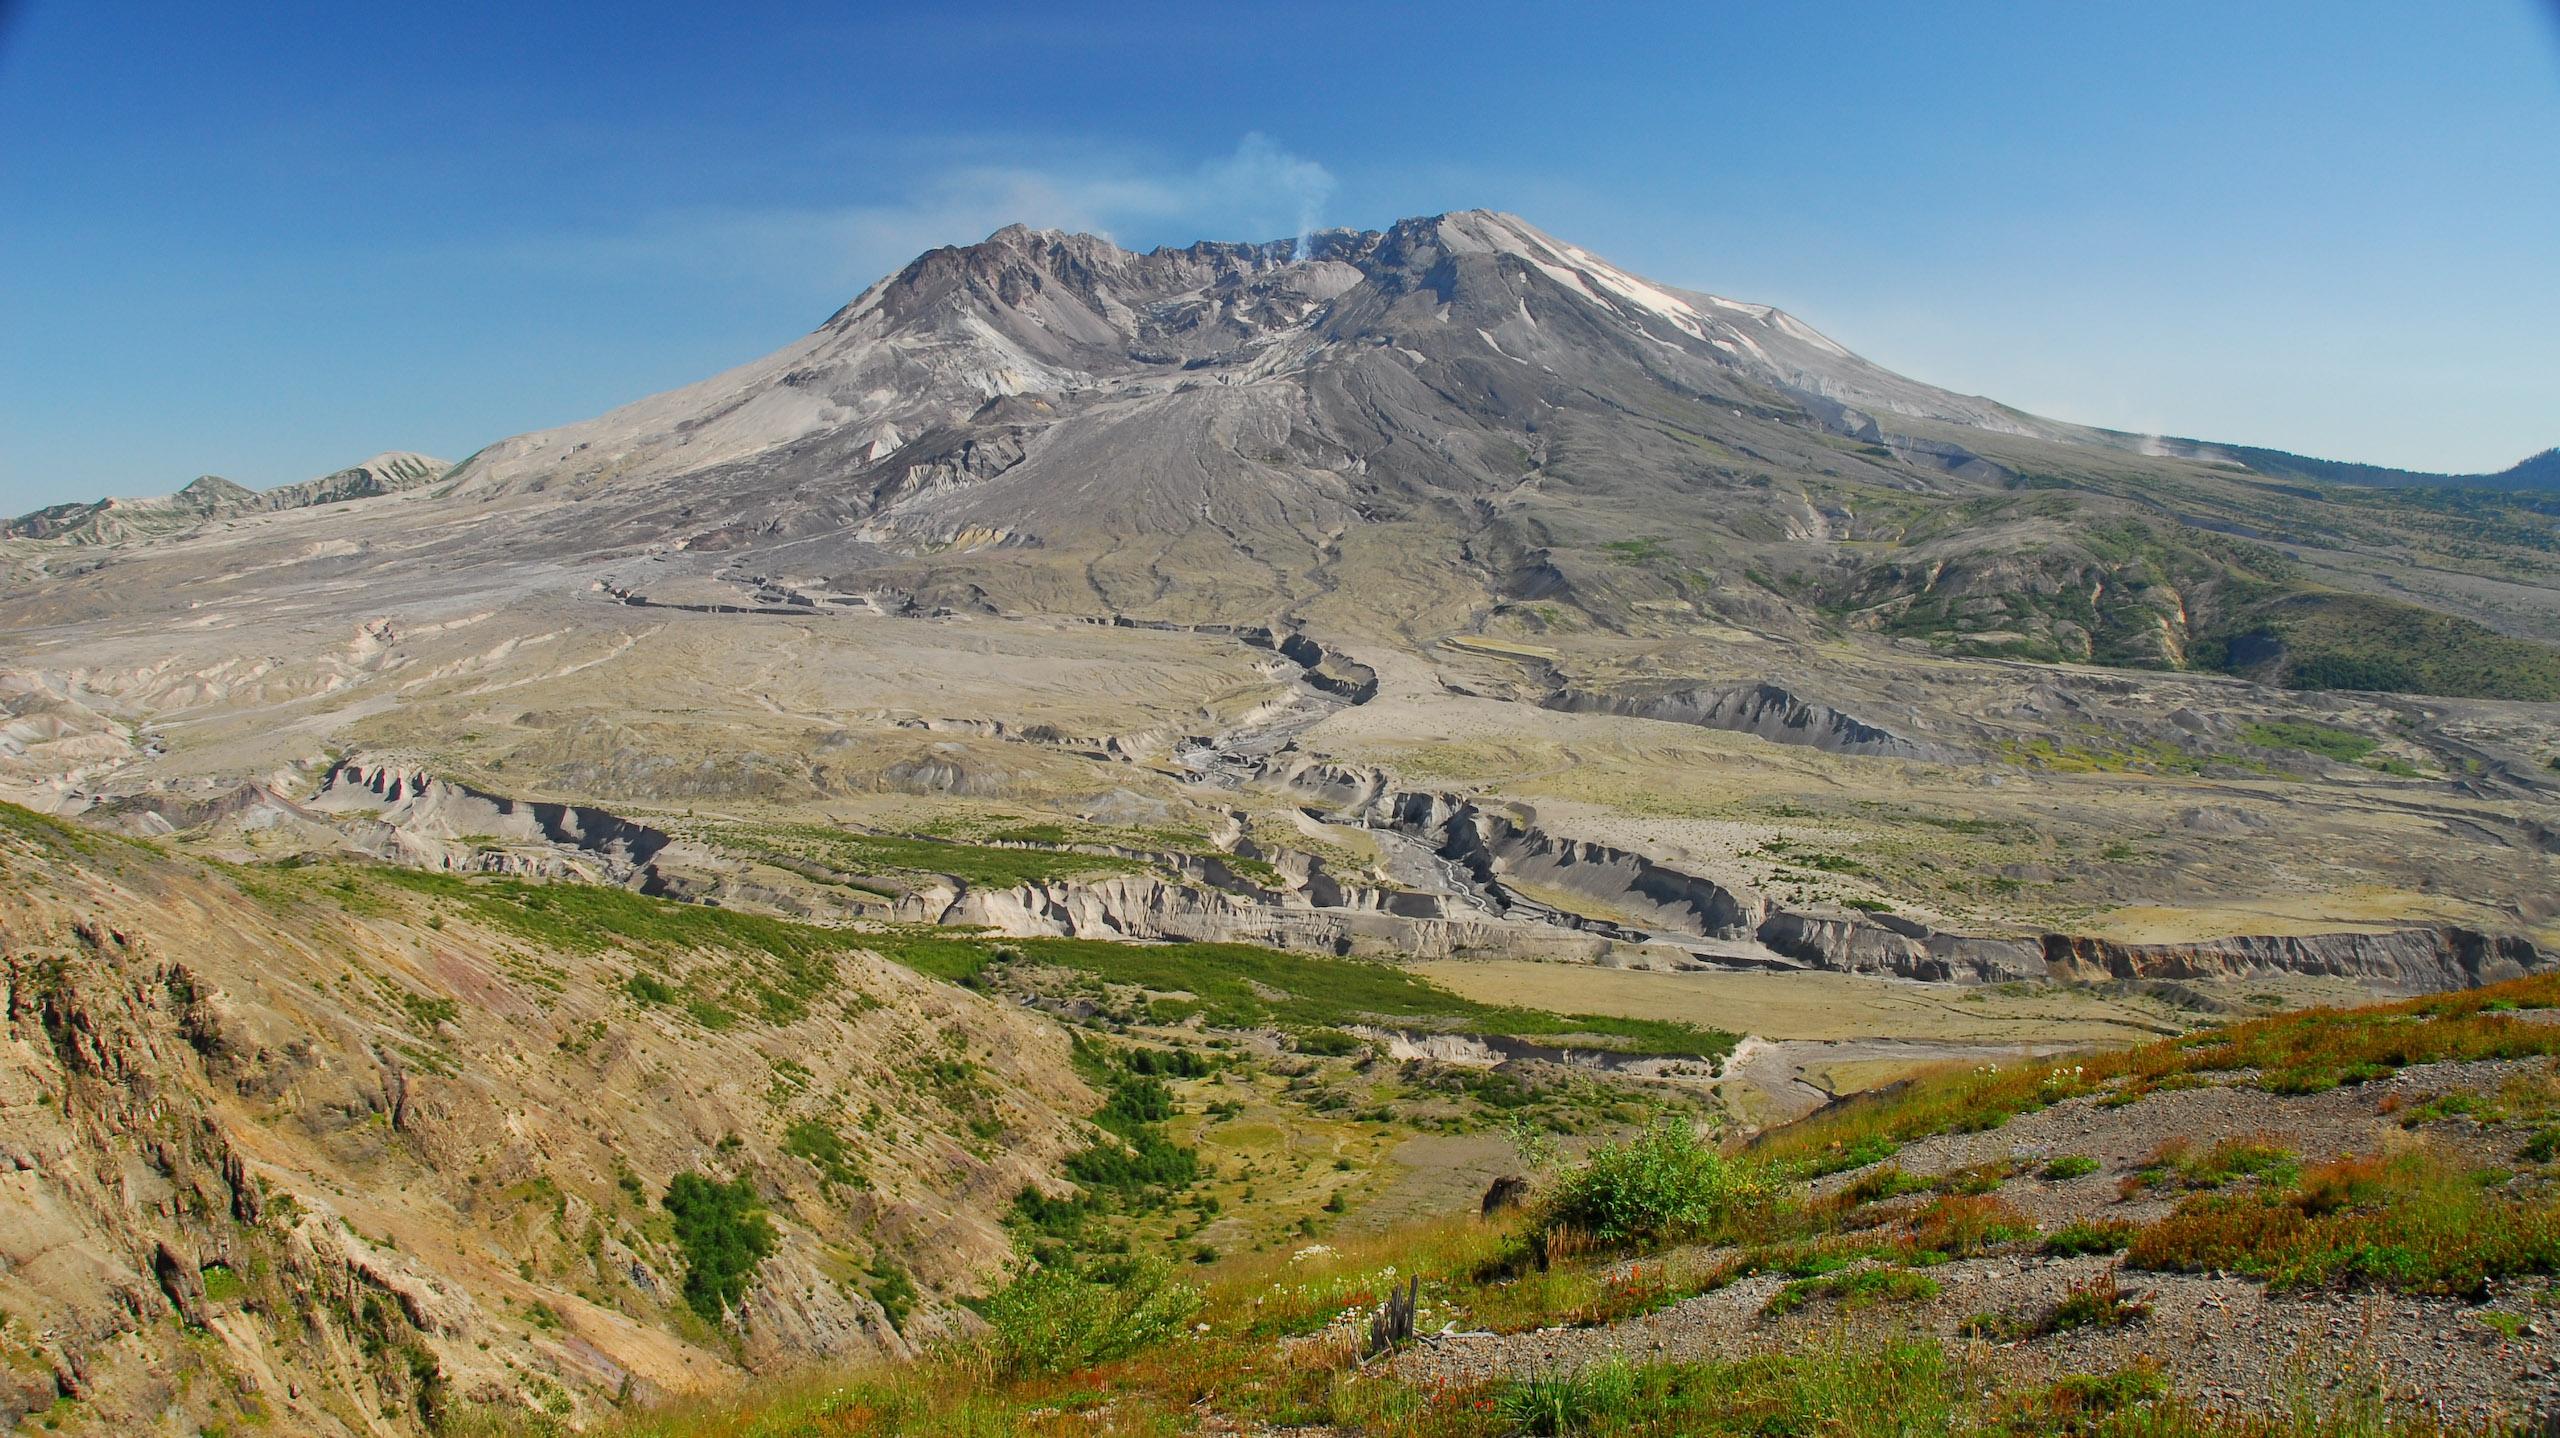 Datei:Mount St. Helens6.jpg